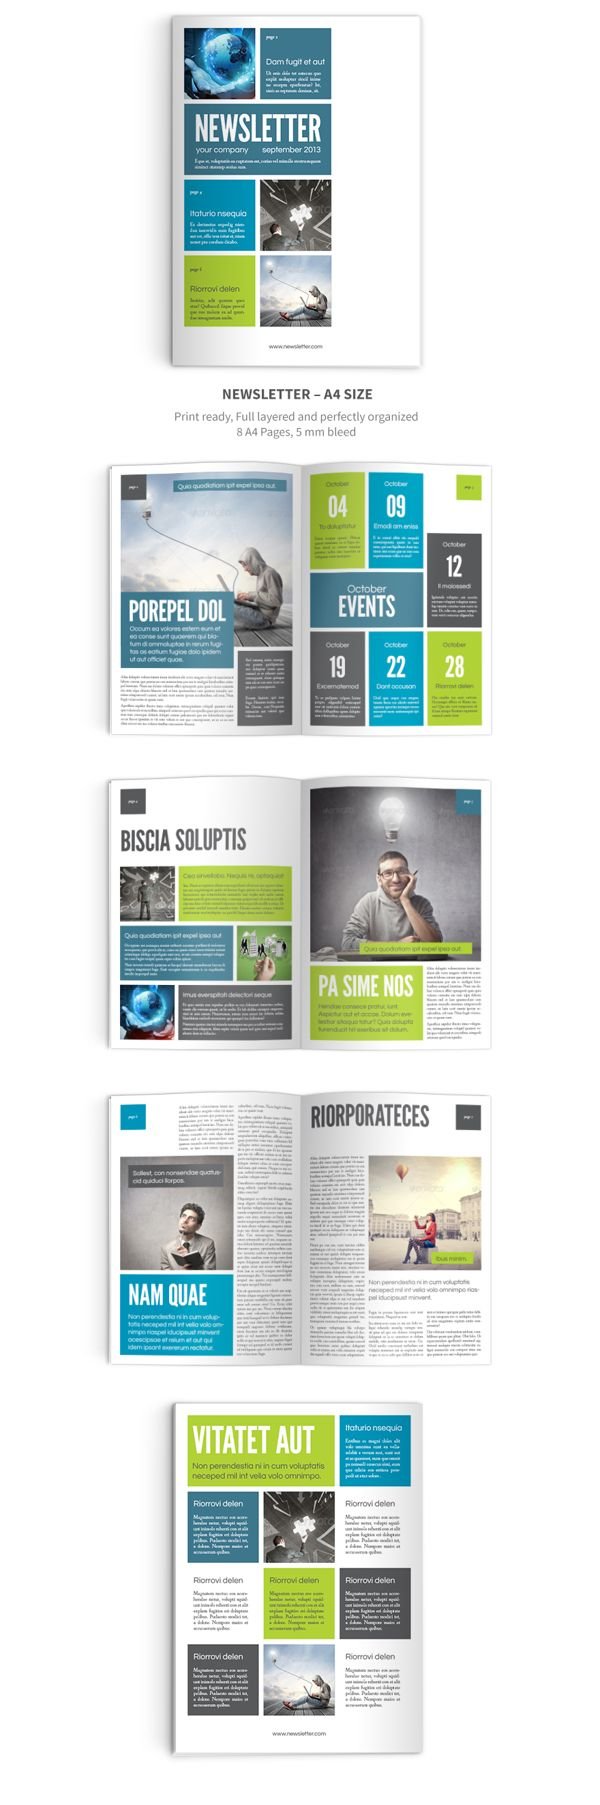 Newsletter Indesign Template by Jan Styblo , via Behance | New Job ...